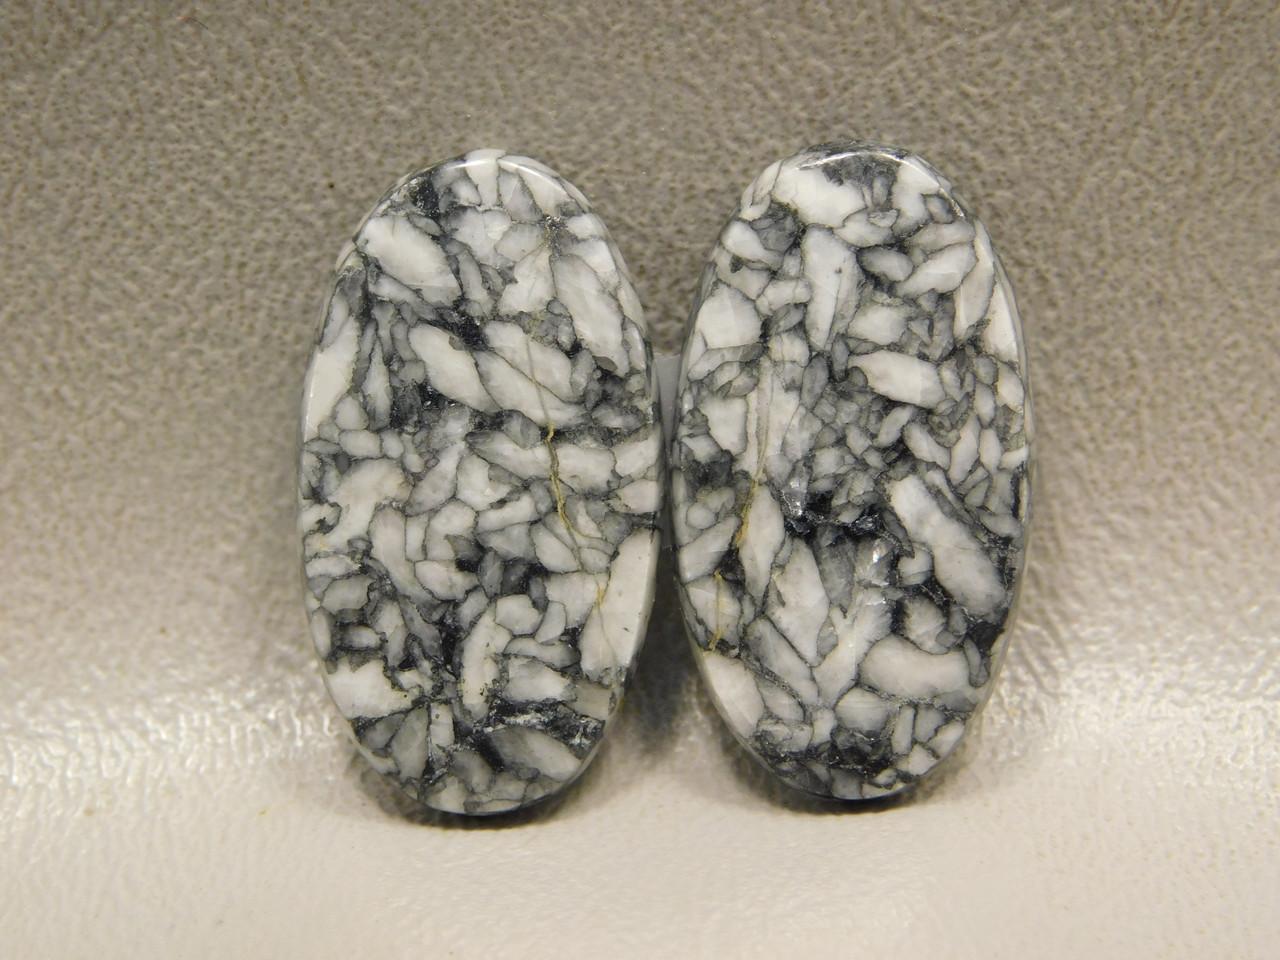 Pinolith or Pinolite Semi Precious Stone Matched Pair Cabochons #19